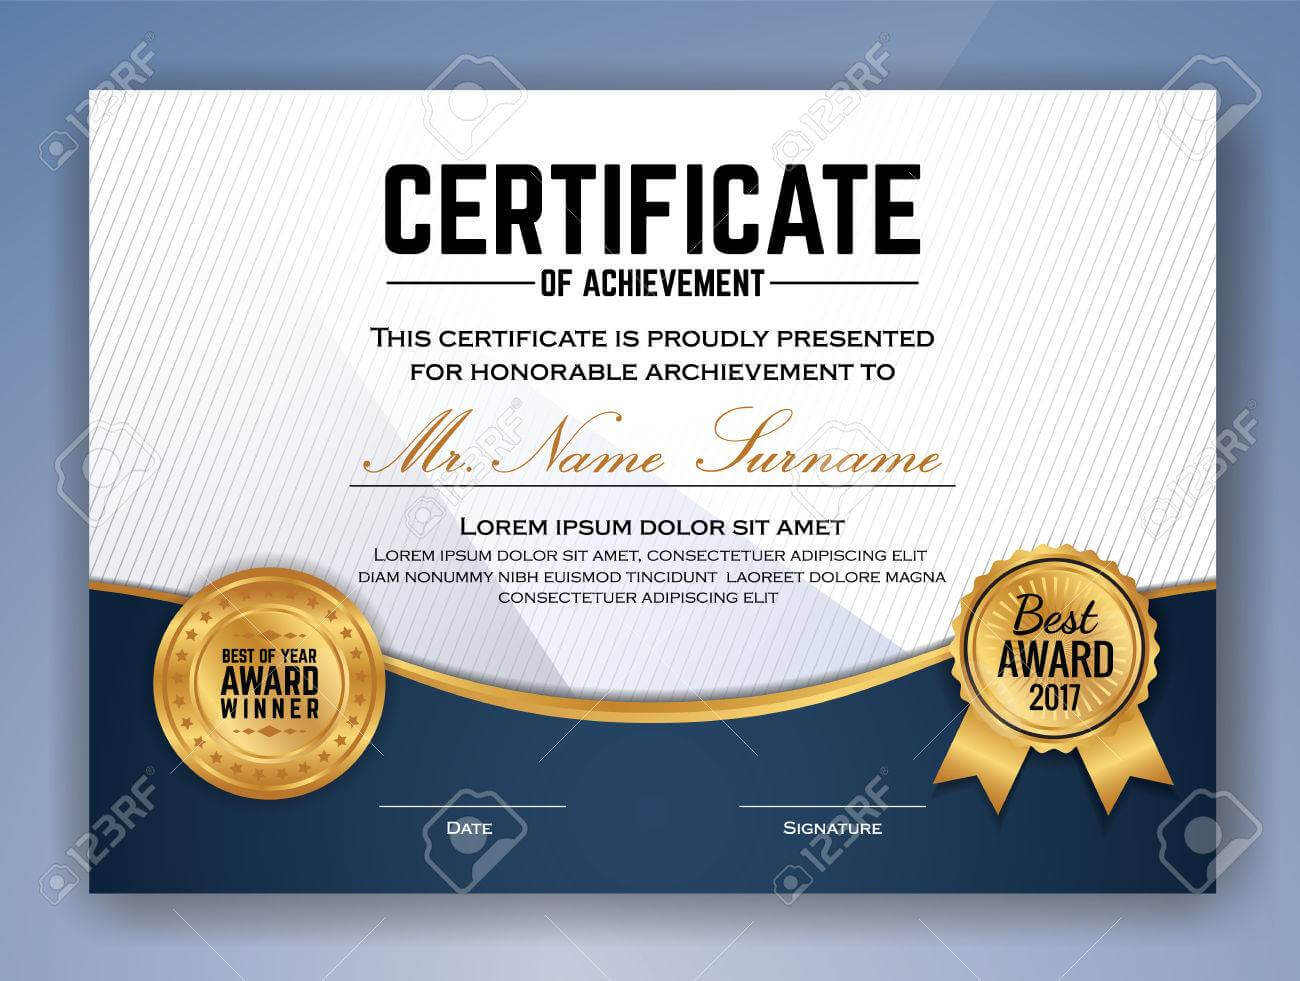 Professional Award Certificate Template - Calep.midnightpig.co With Regard To Professional Award Certificate Template